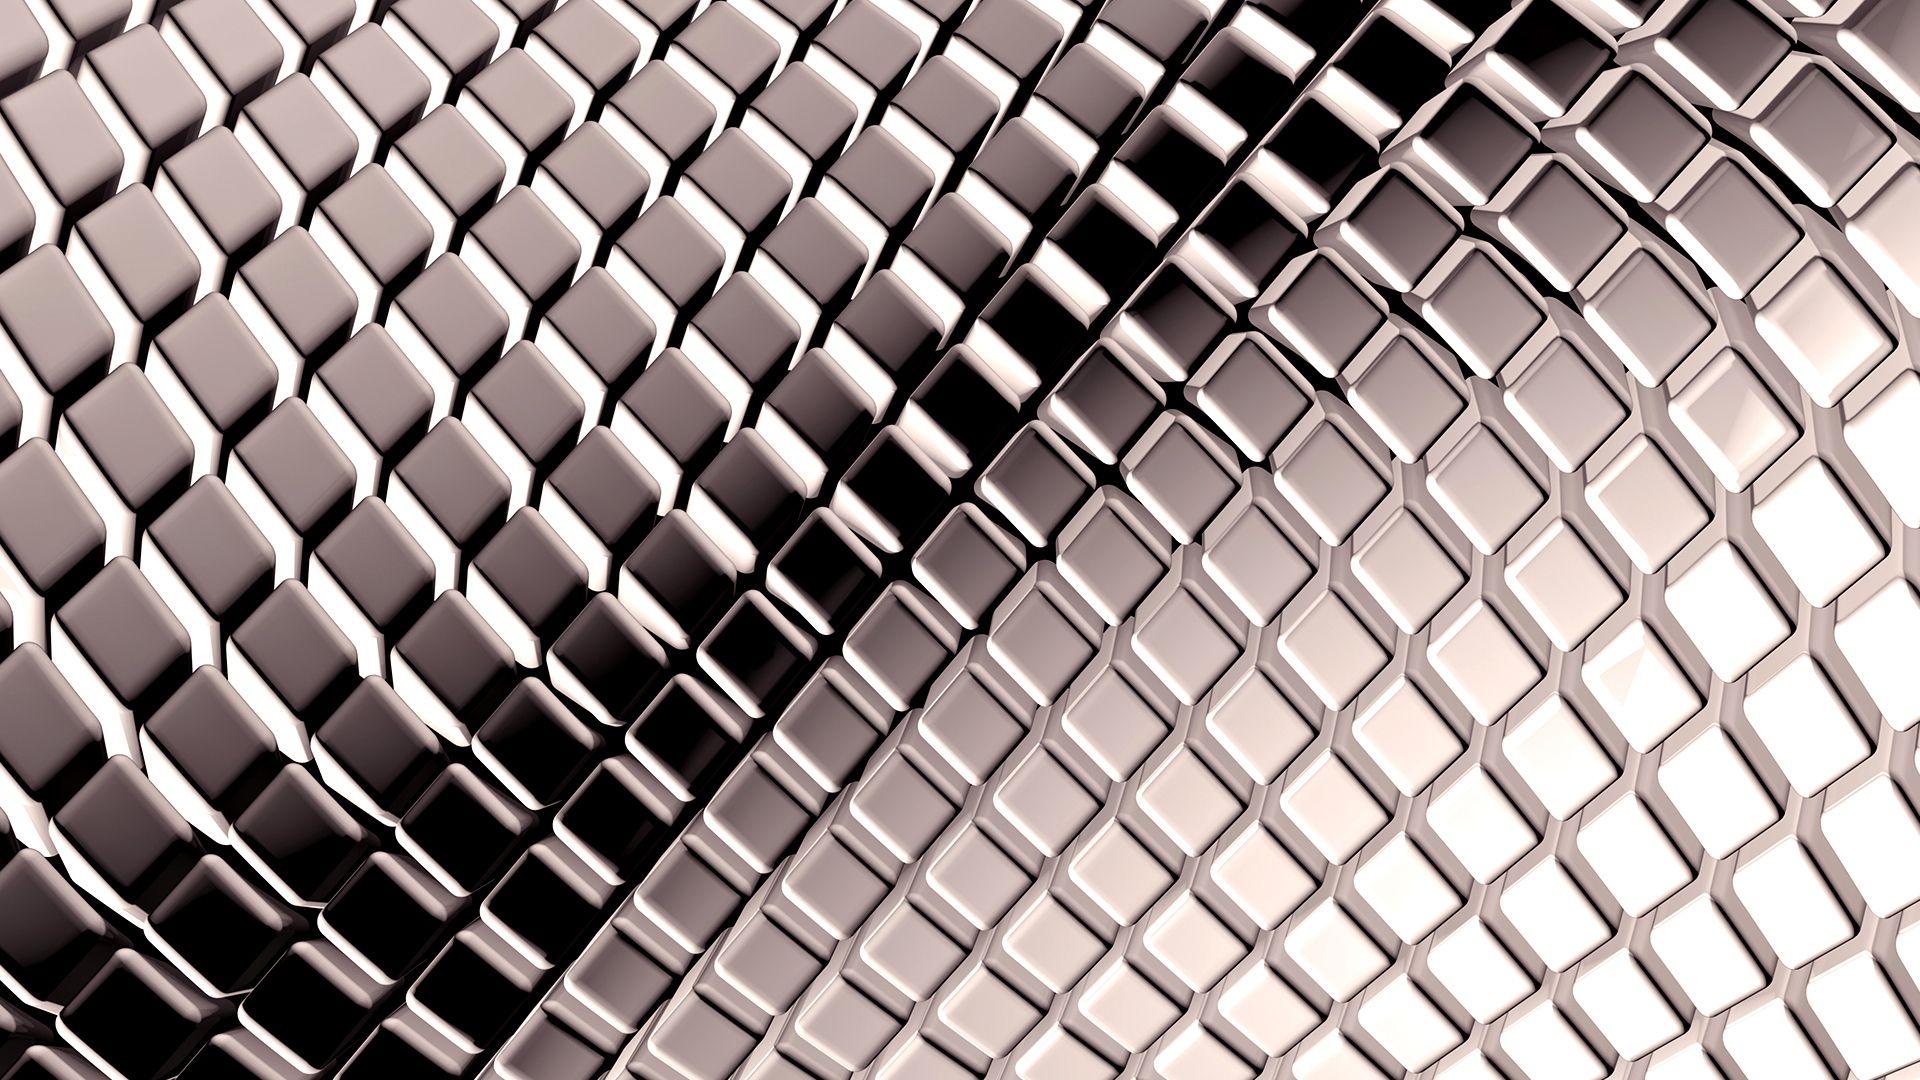 Silver hd wallpaper download